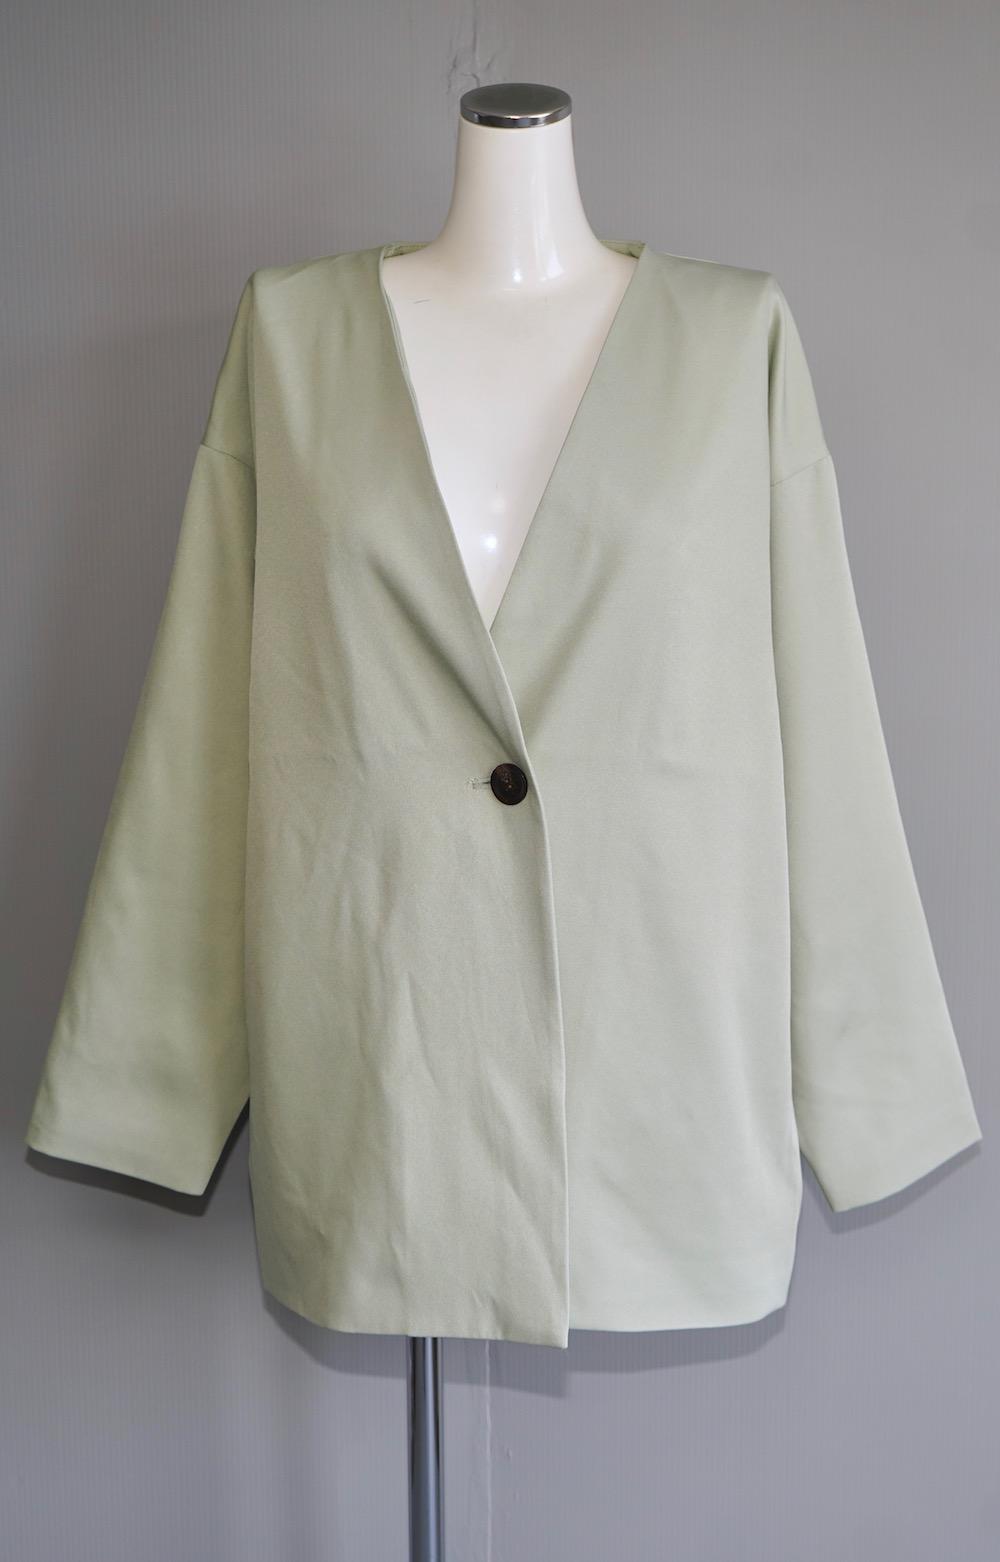 No-Collar Jacket + Slacks 2P SET UP (pale mint)